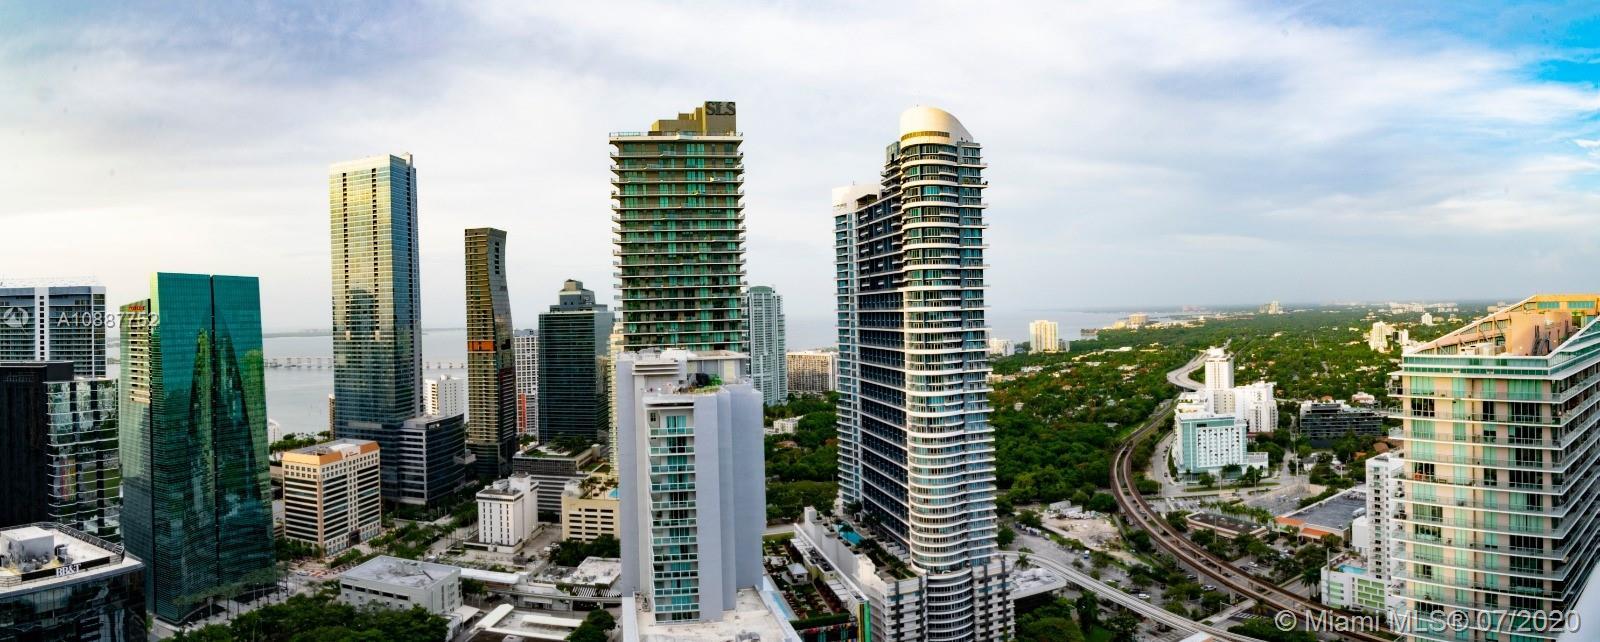 1100 Millecento #4102 - 1100 S Miami Ave #4102, Miami, FL 33130